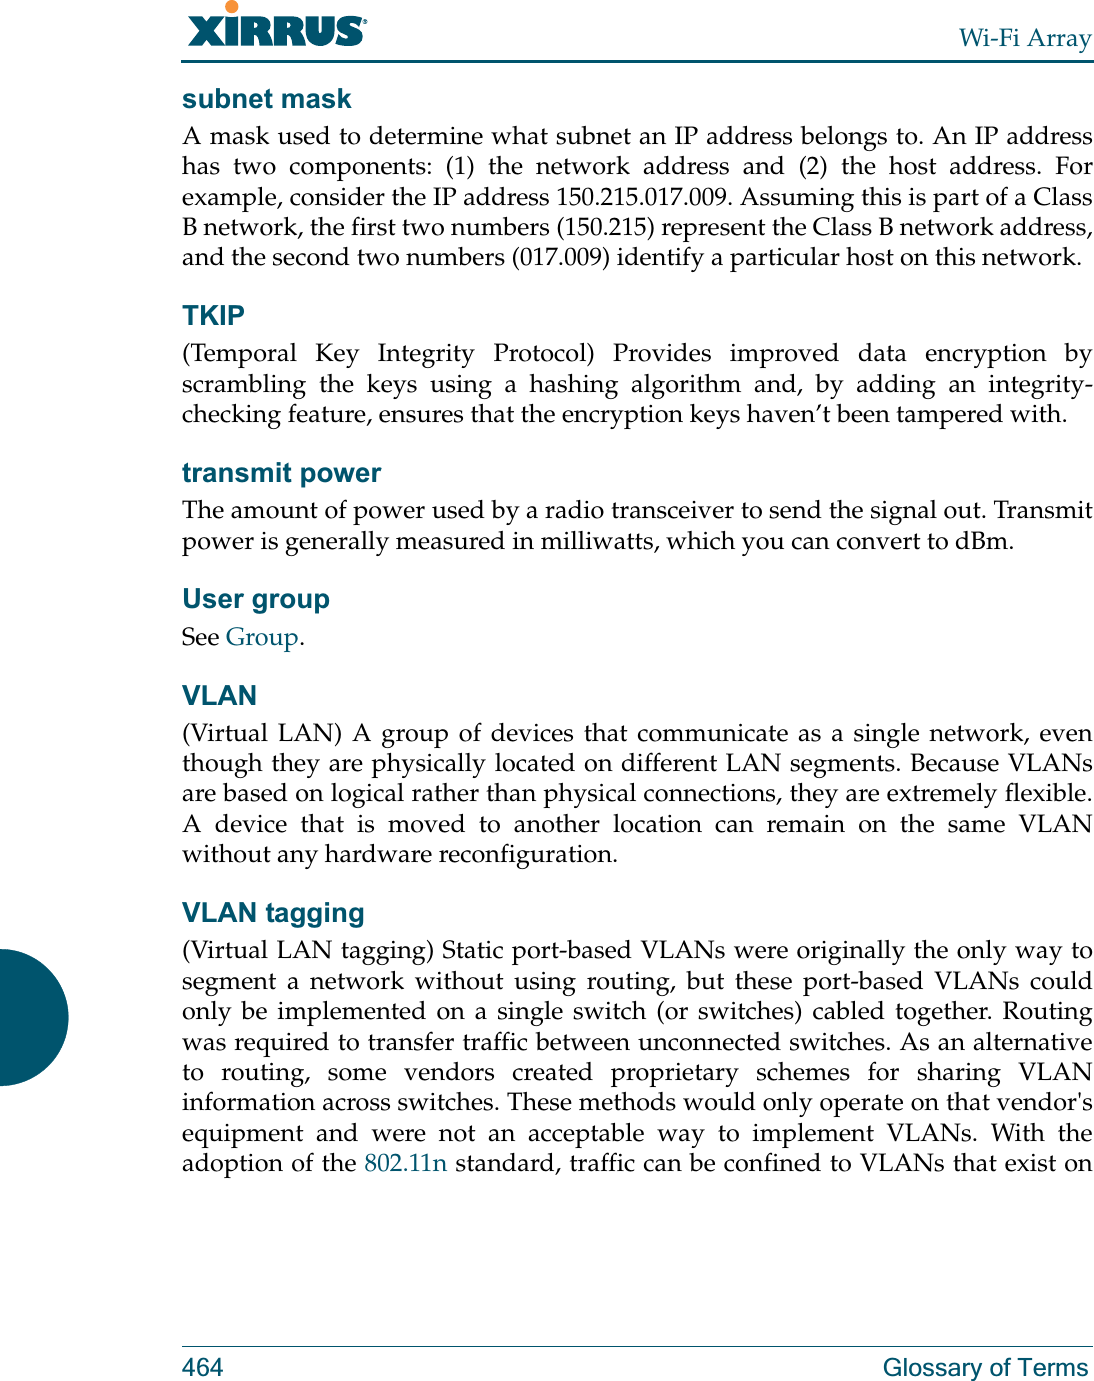 Riverbed Technology XN4 Wireless LAN Array User Manual